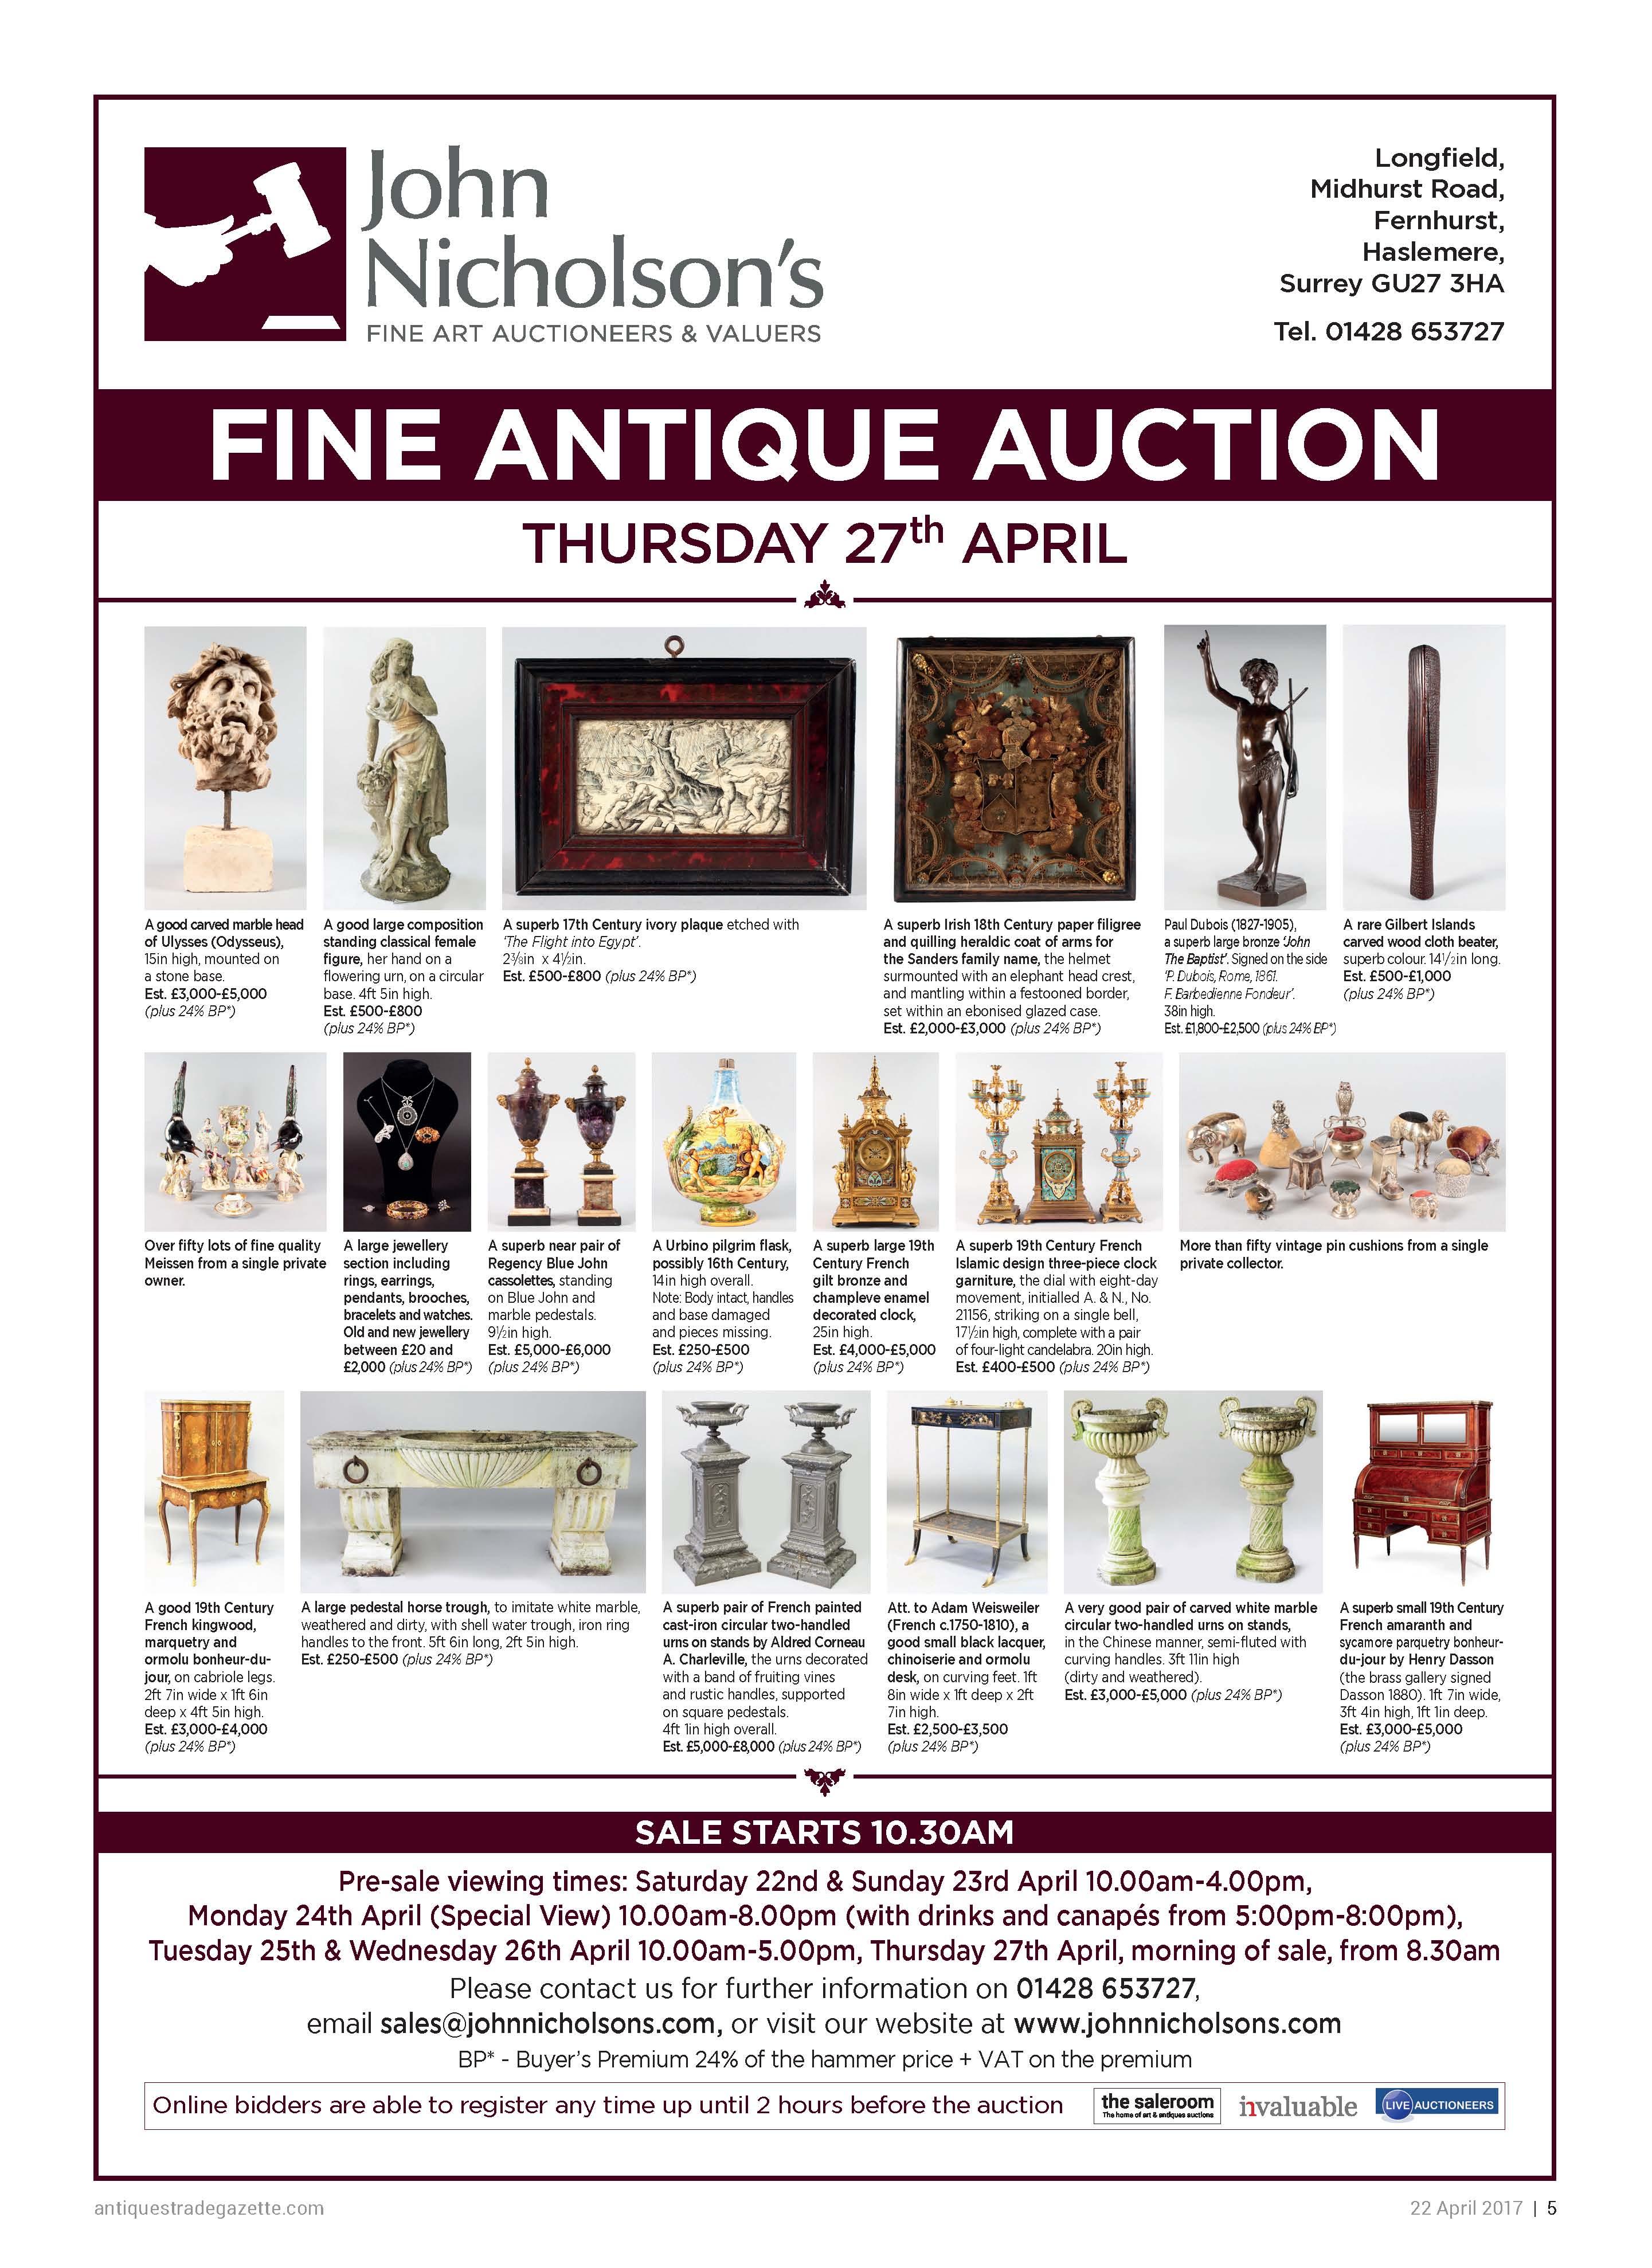 John Nicholson - Fine Antiques.jpg